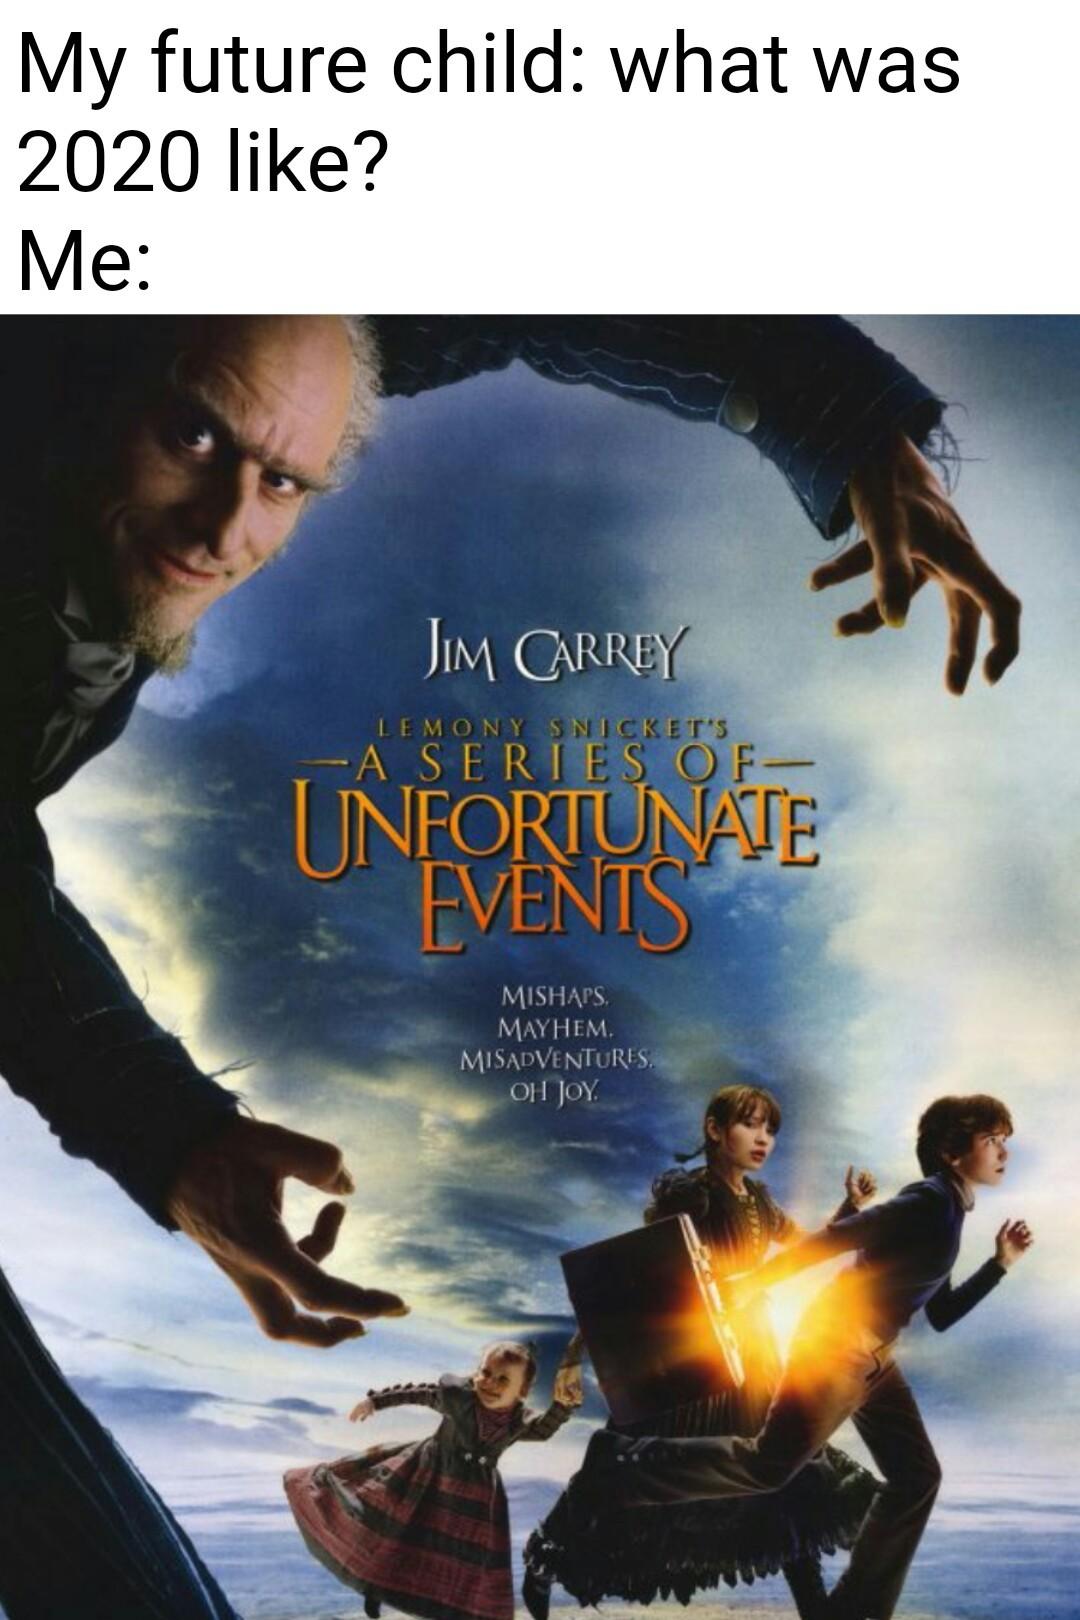 Baszd meg kurva - meme